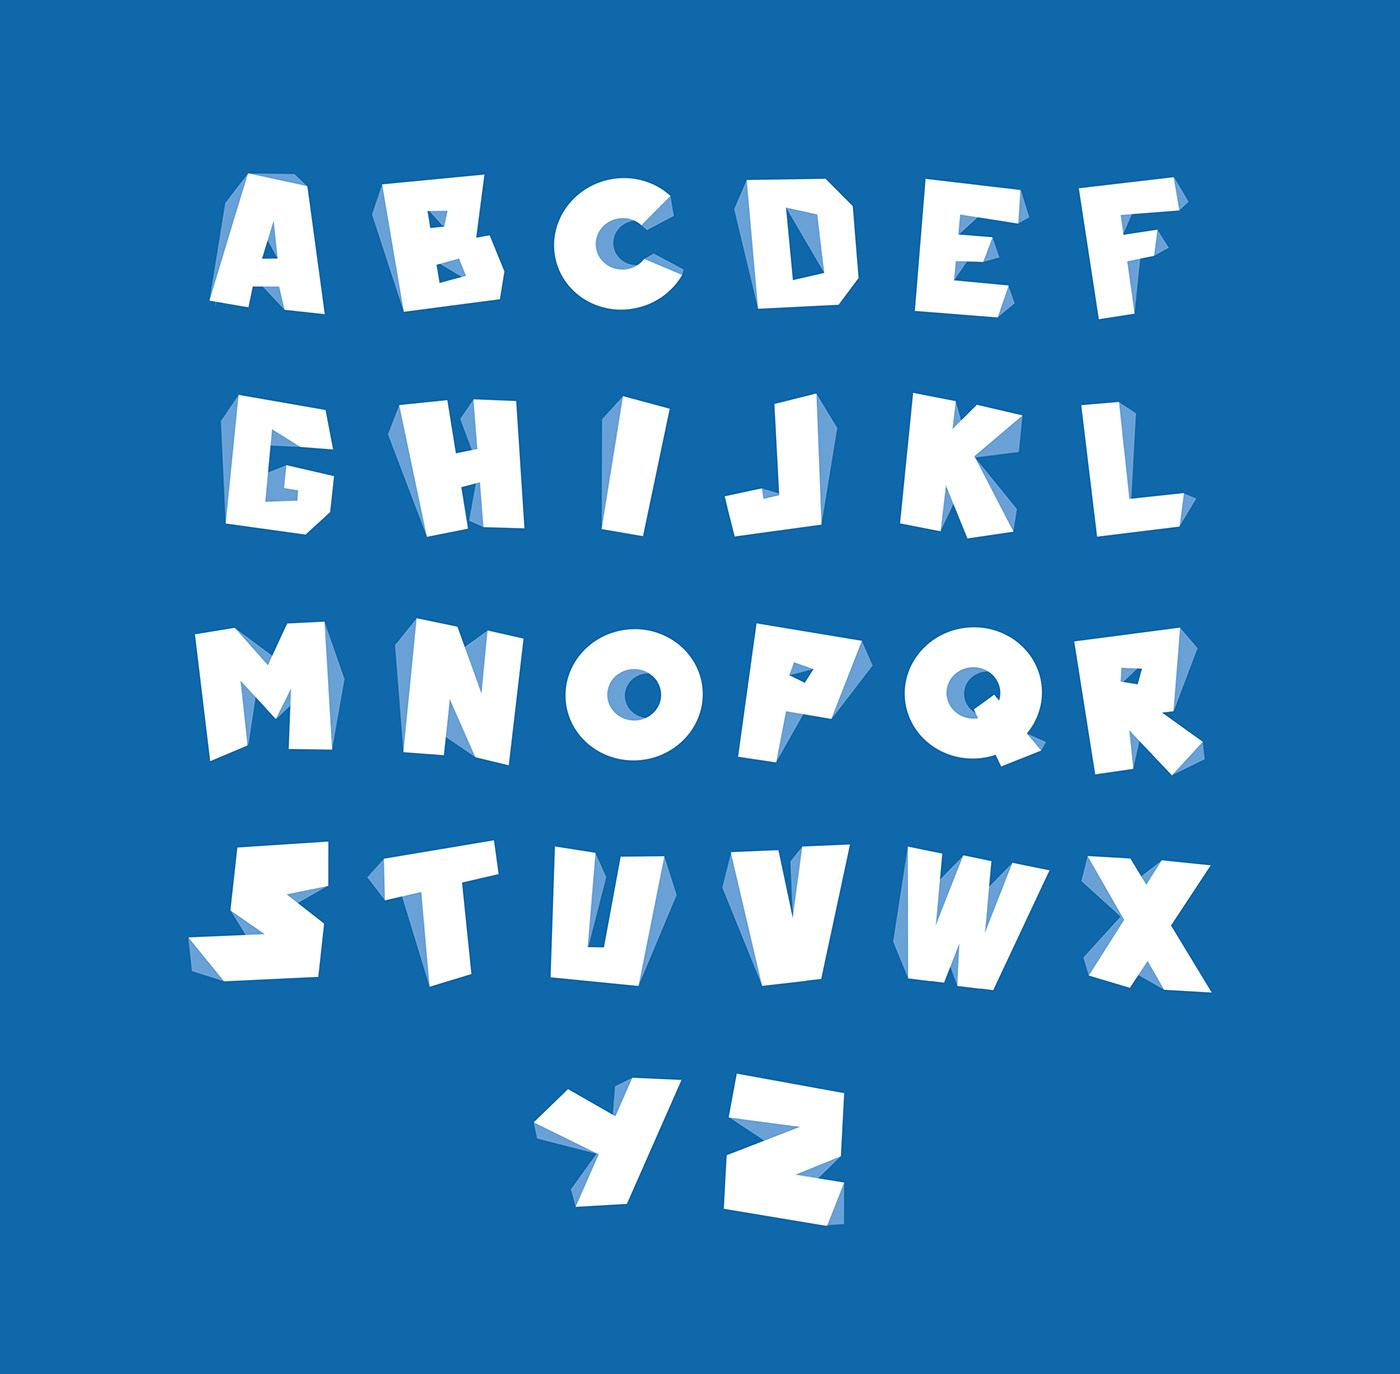 font Free font NOKO font Sideboard font Display typo ligature free type fonts new